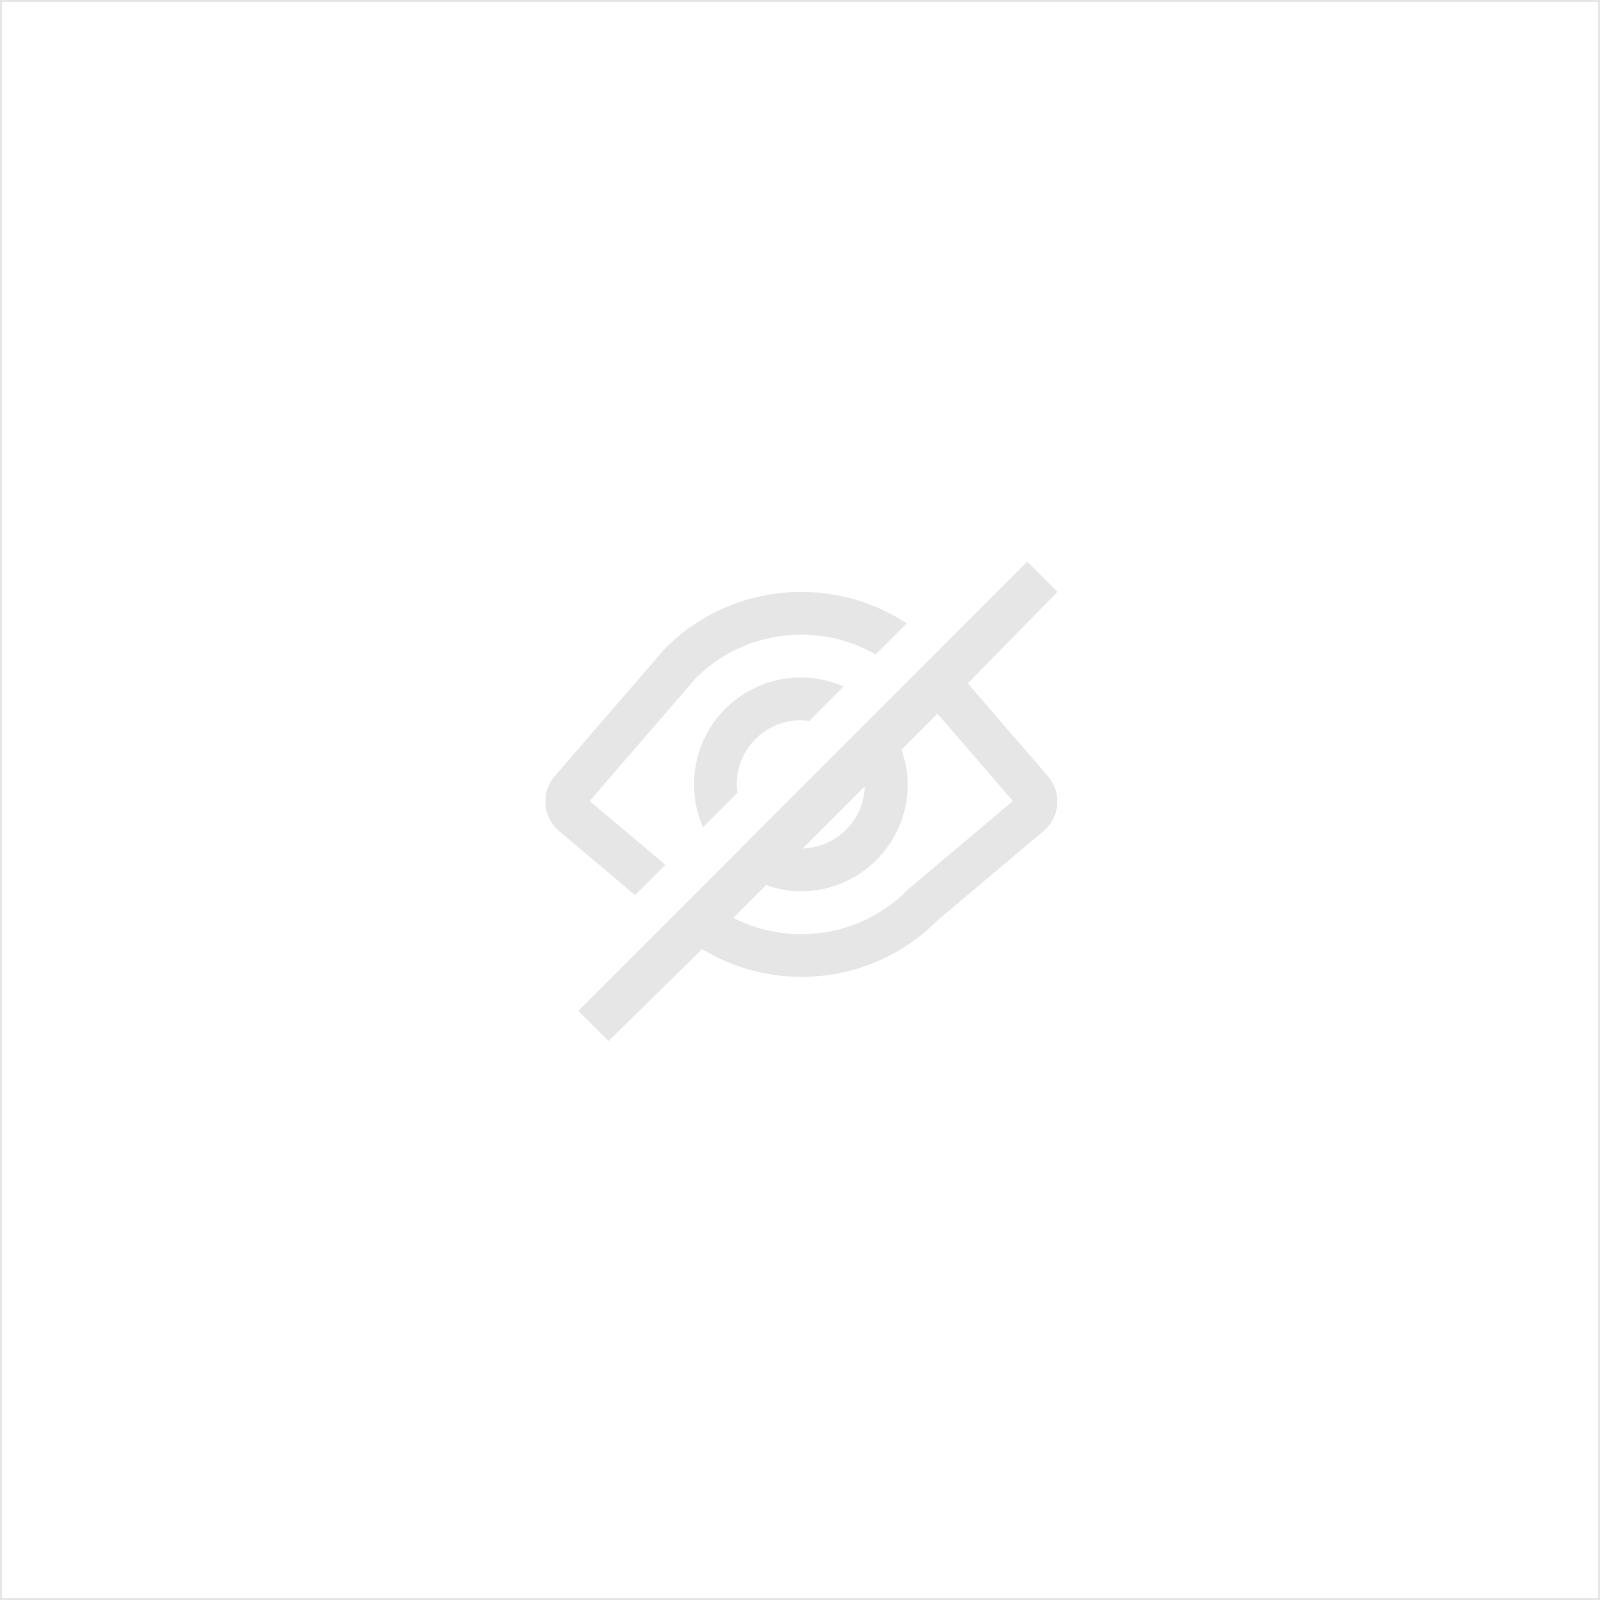 SALOPETTE  JETABLE (PEINTURE) EXTRA EXTRA LARGE